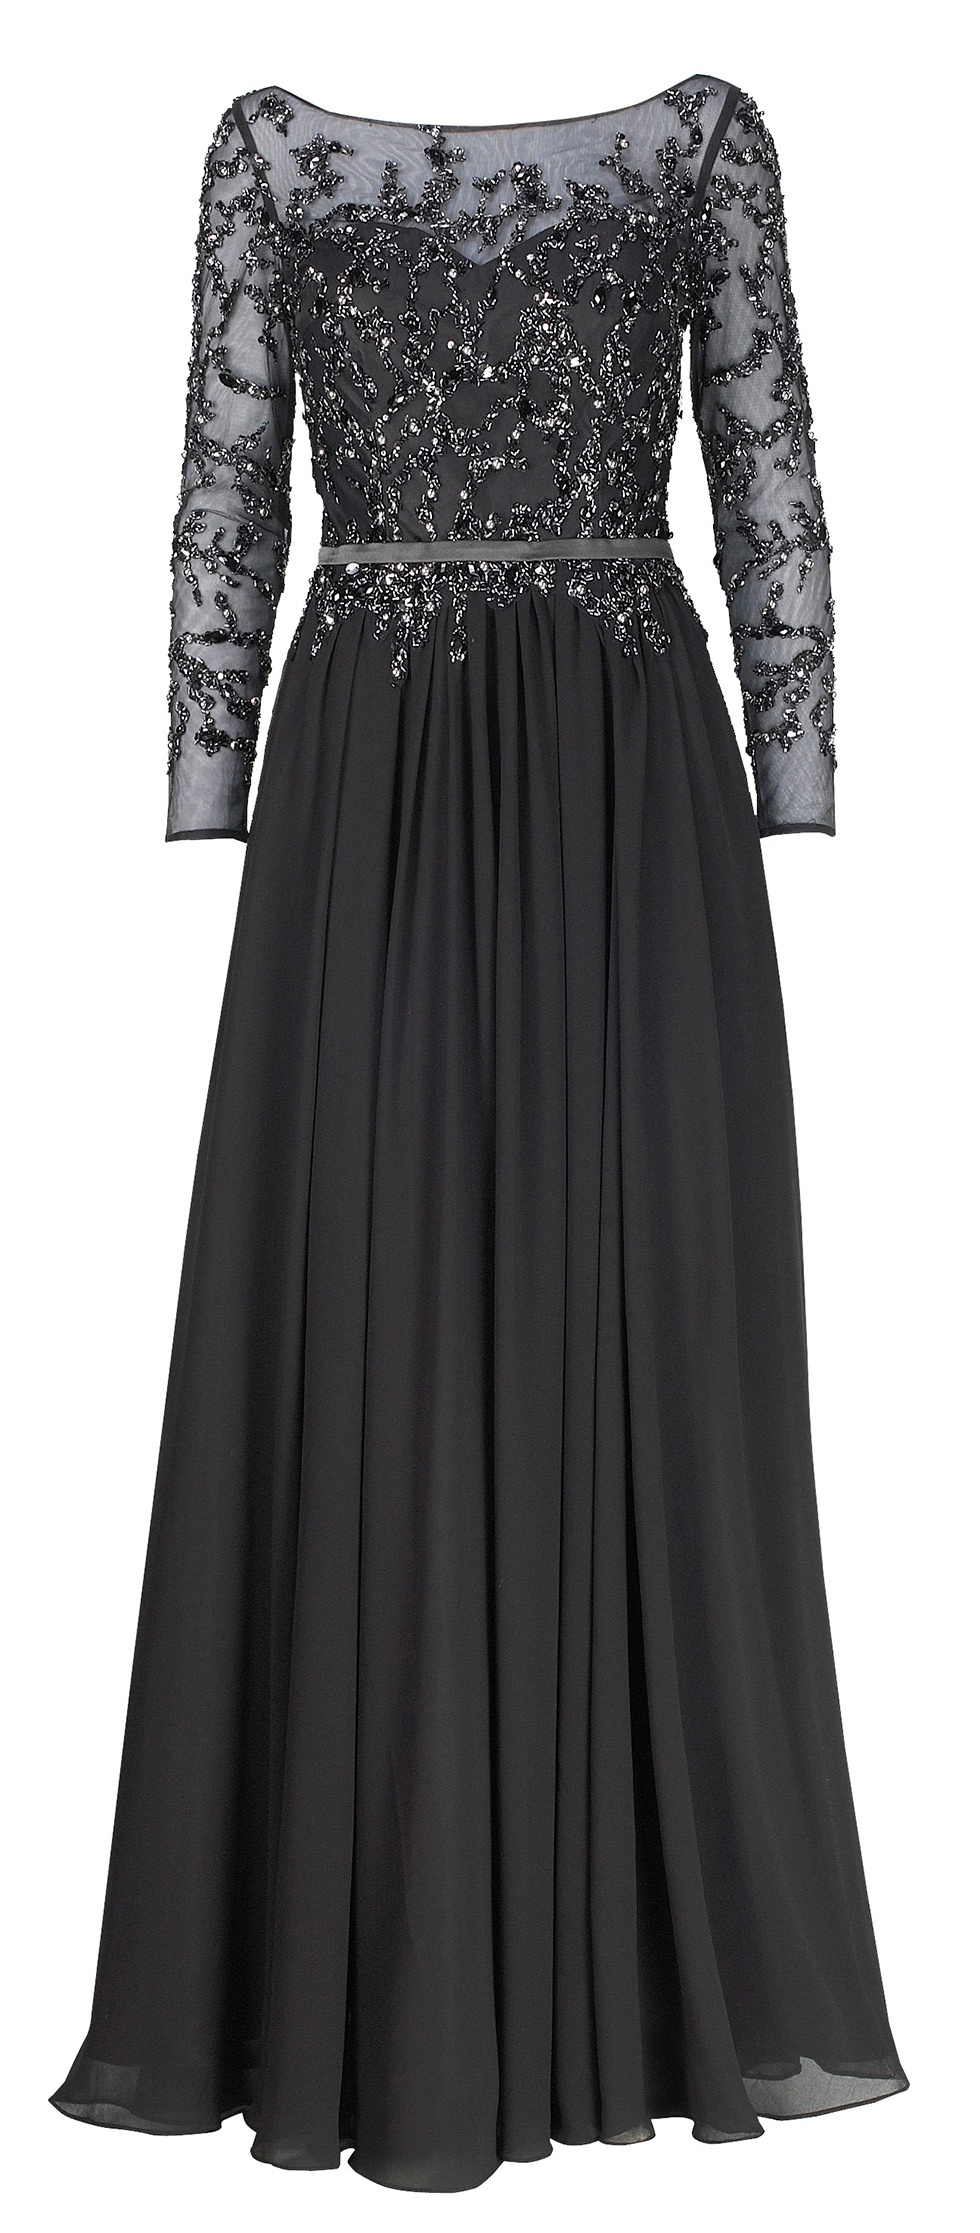 4 Dress front-2